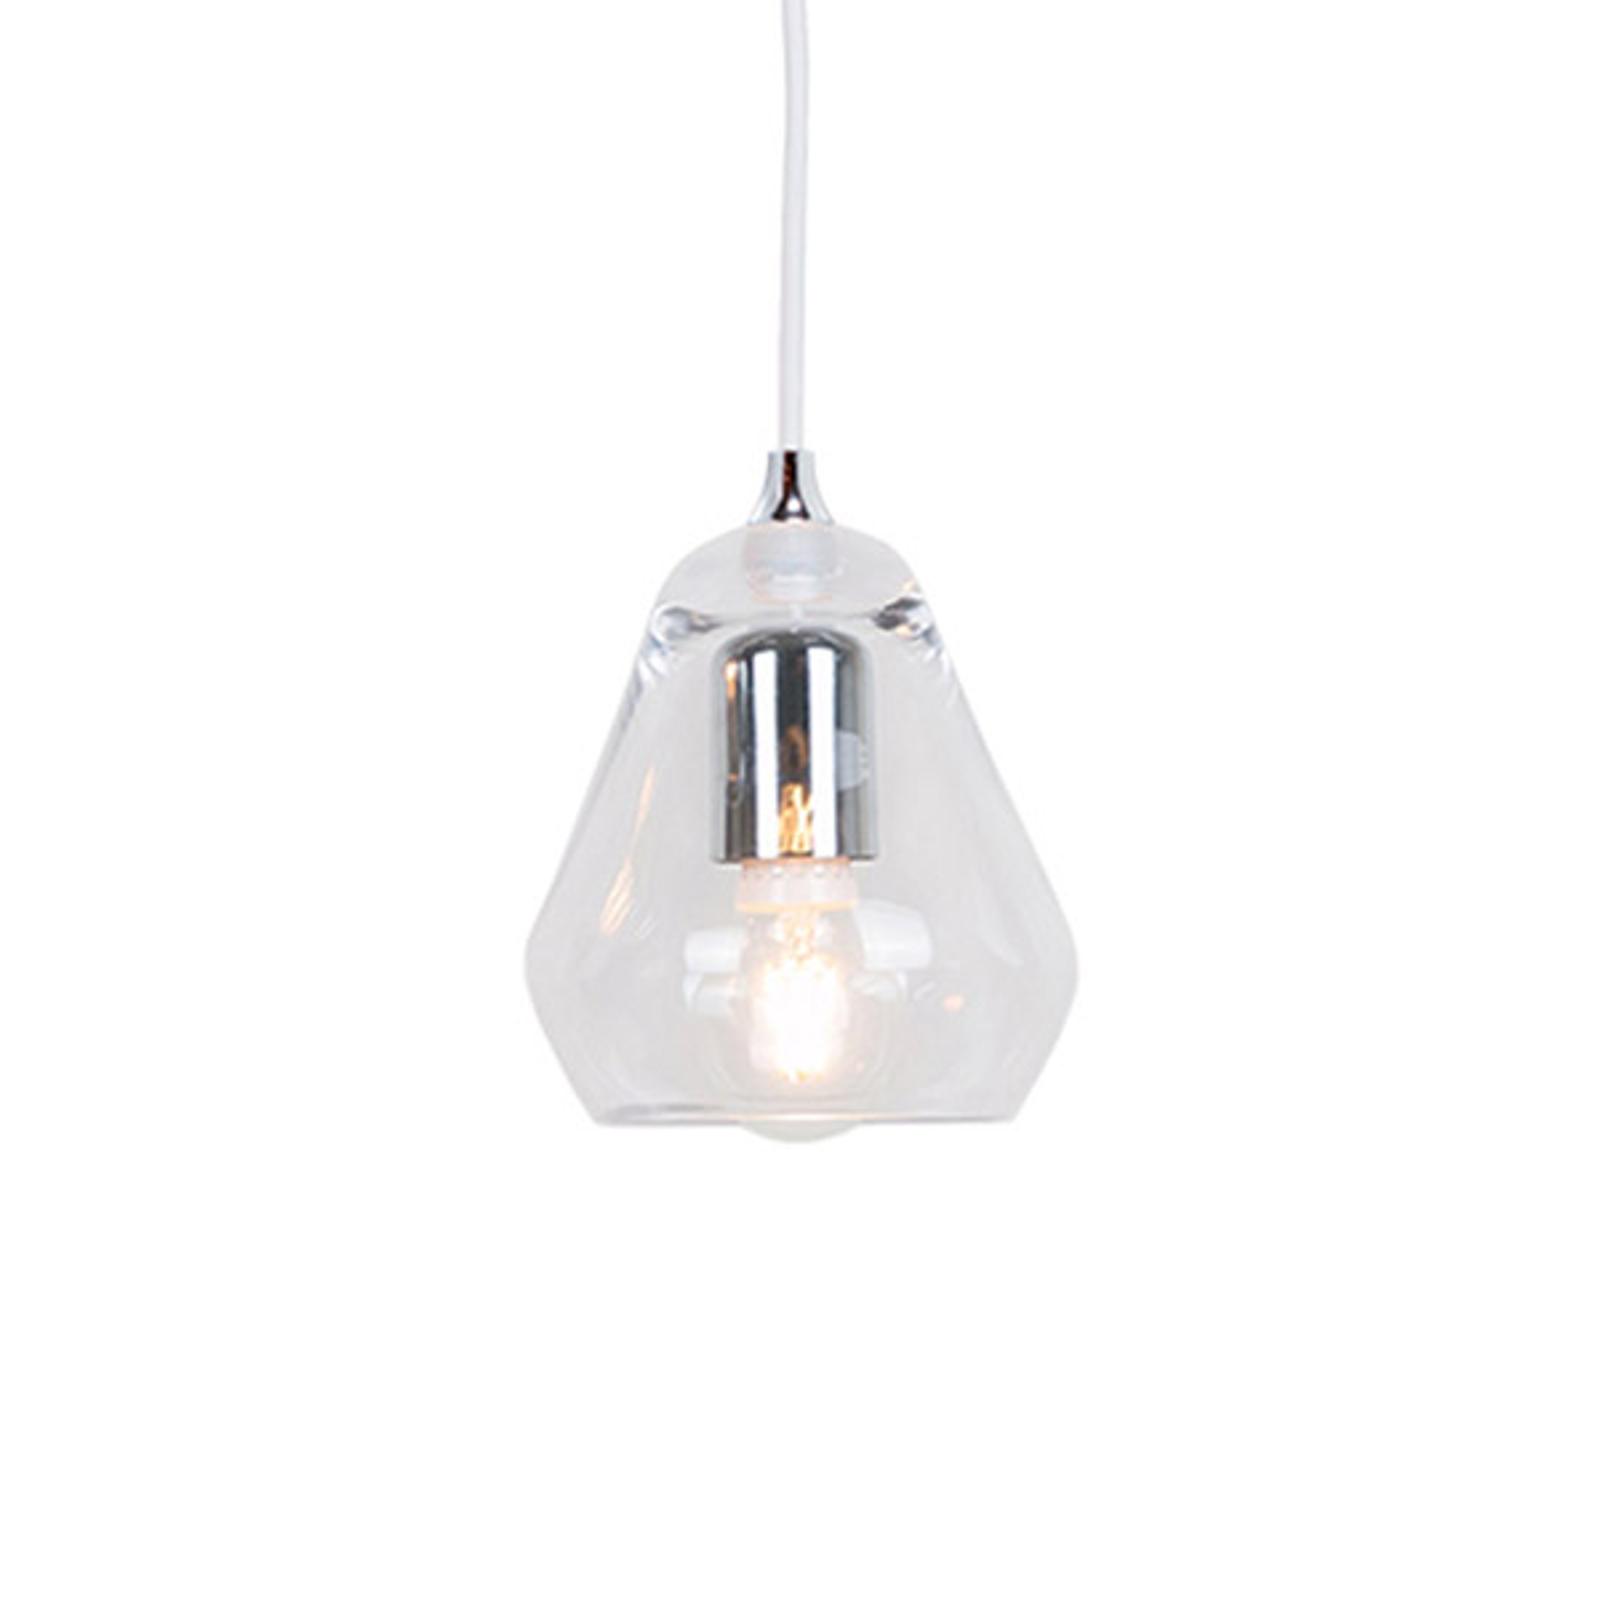 Innermost Core 15 - szklana lampa wisząca